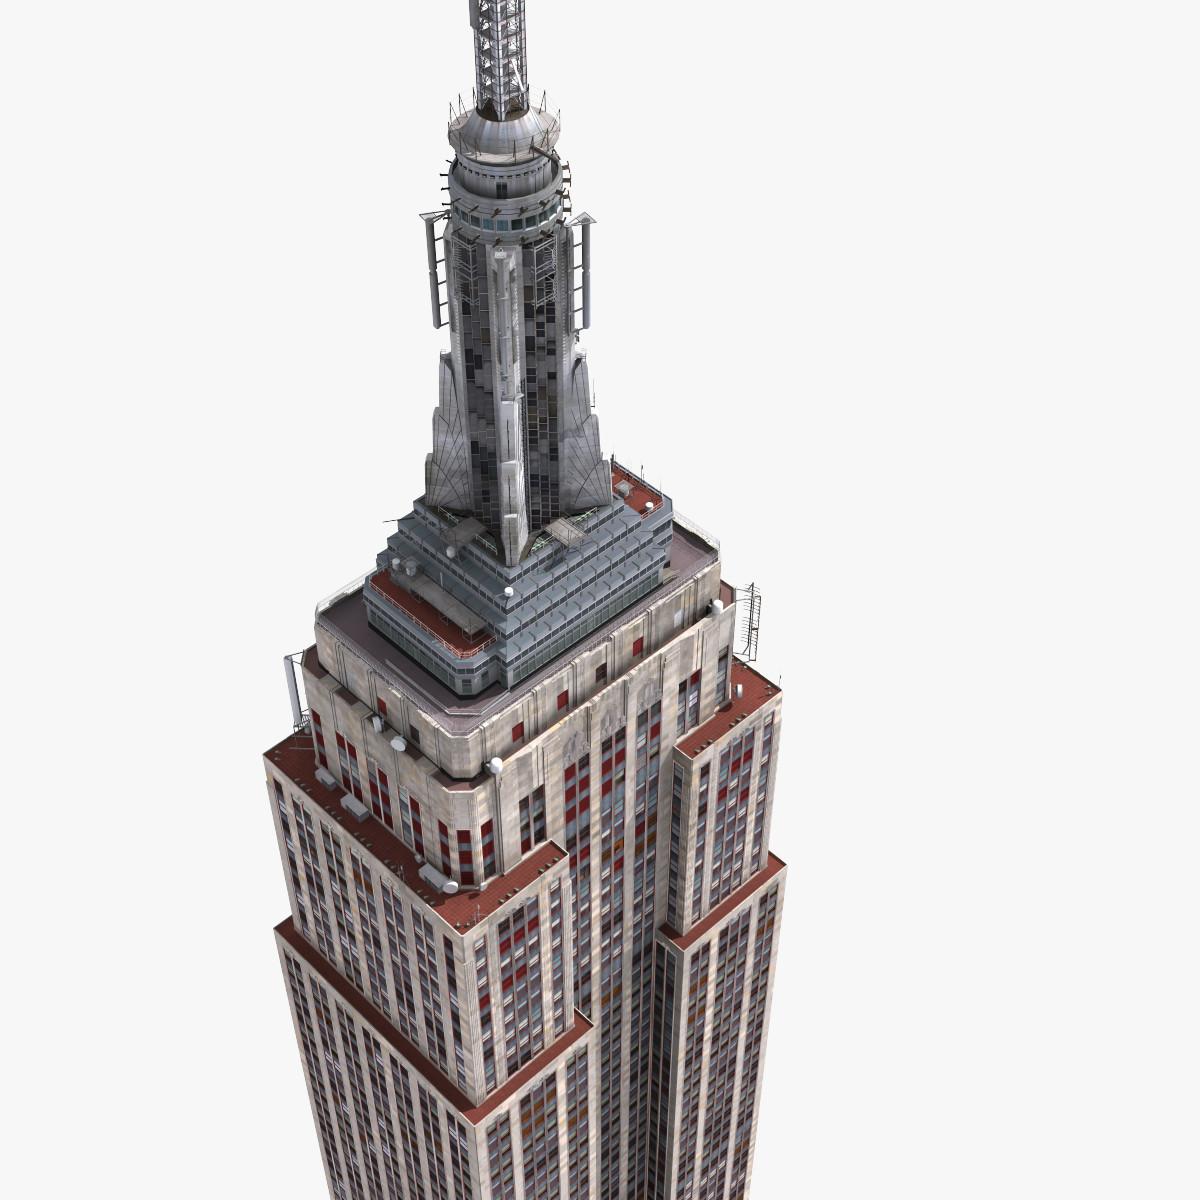 Empire_state_building_render_01.jpg